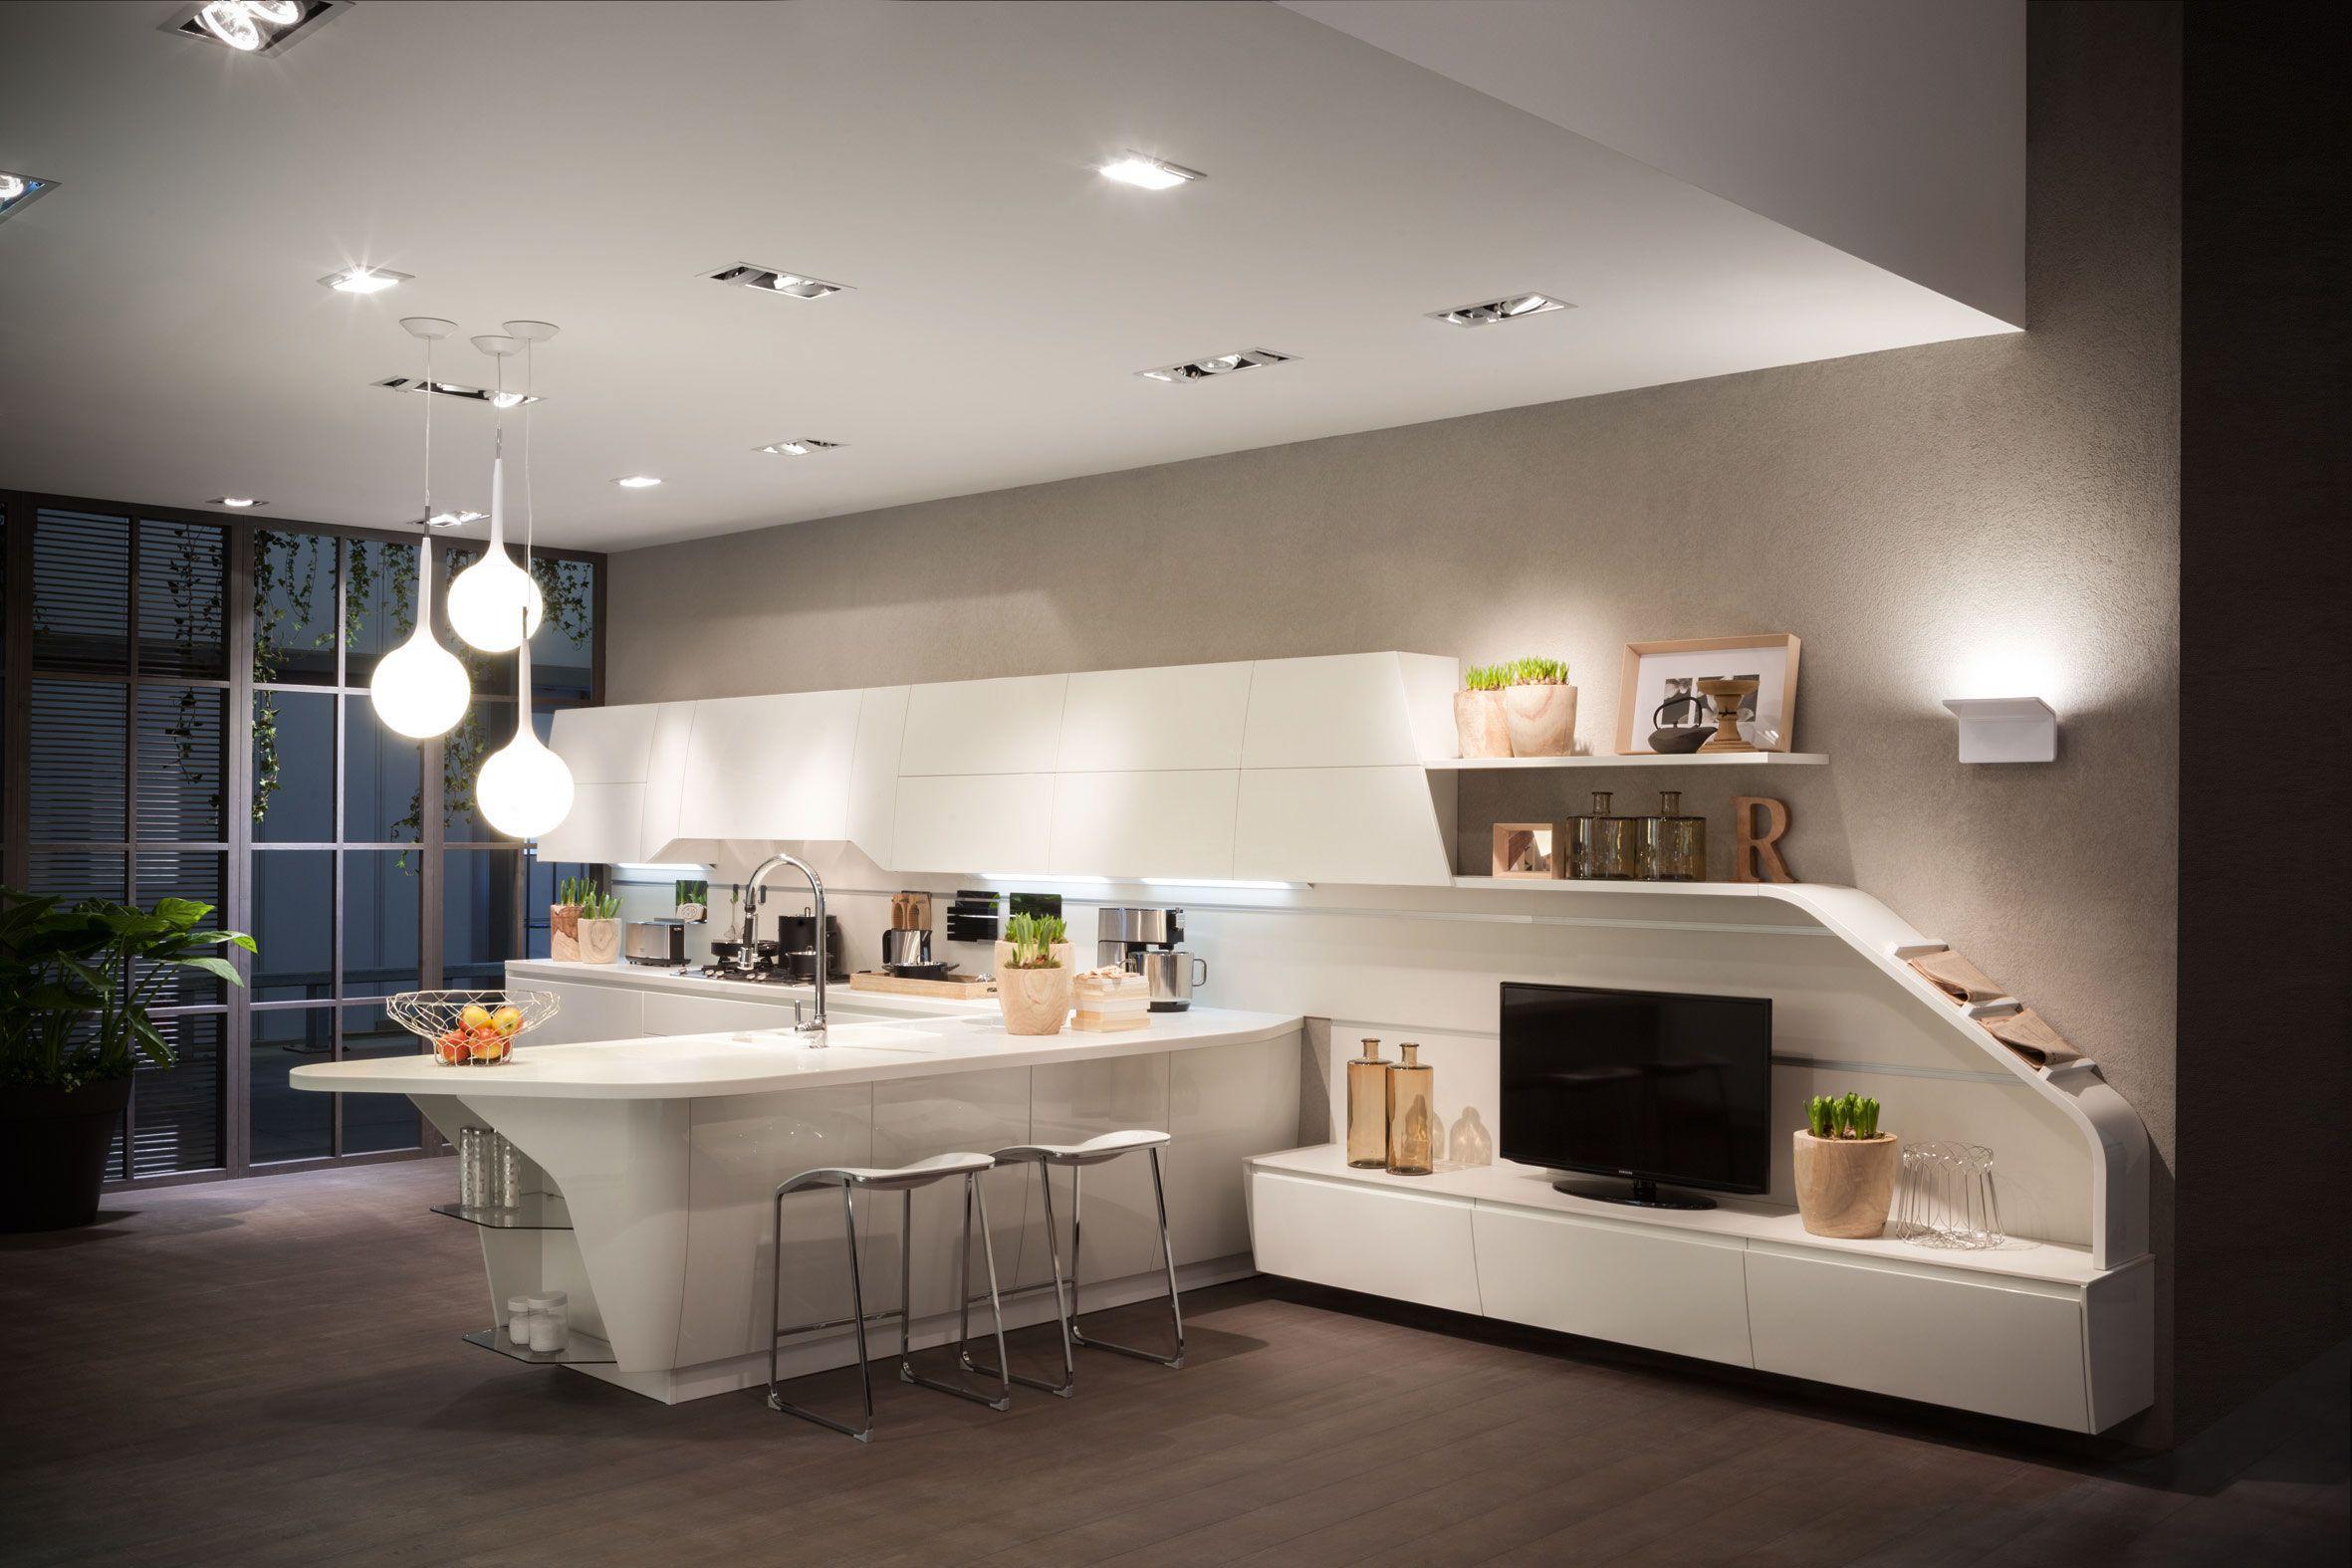 Beautiful Arredamento Cucina Soggiorno Ambiente Unico Images ...